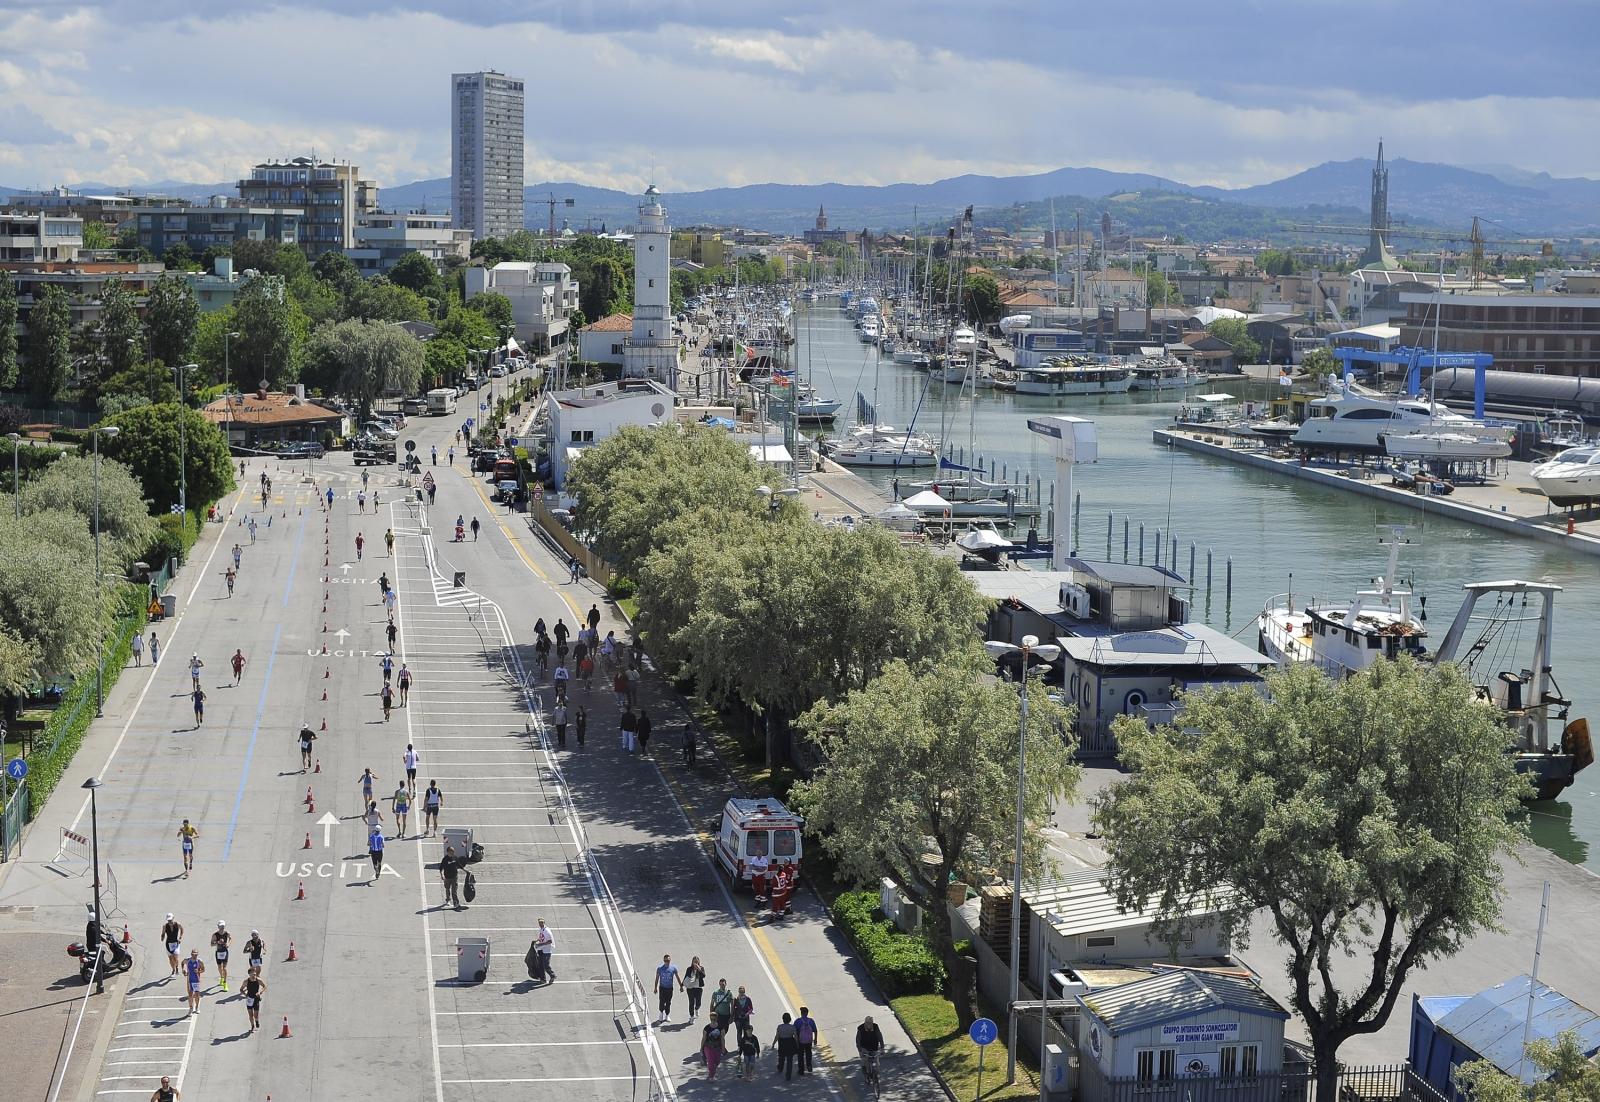 A view of Rimini harbour